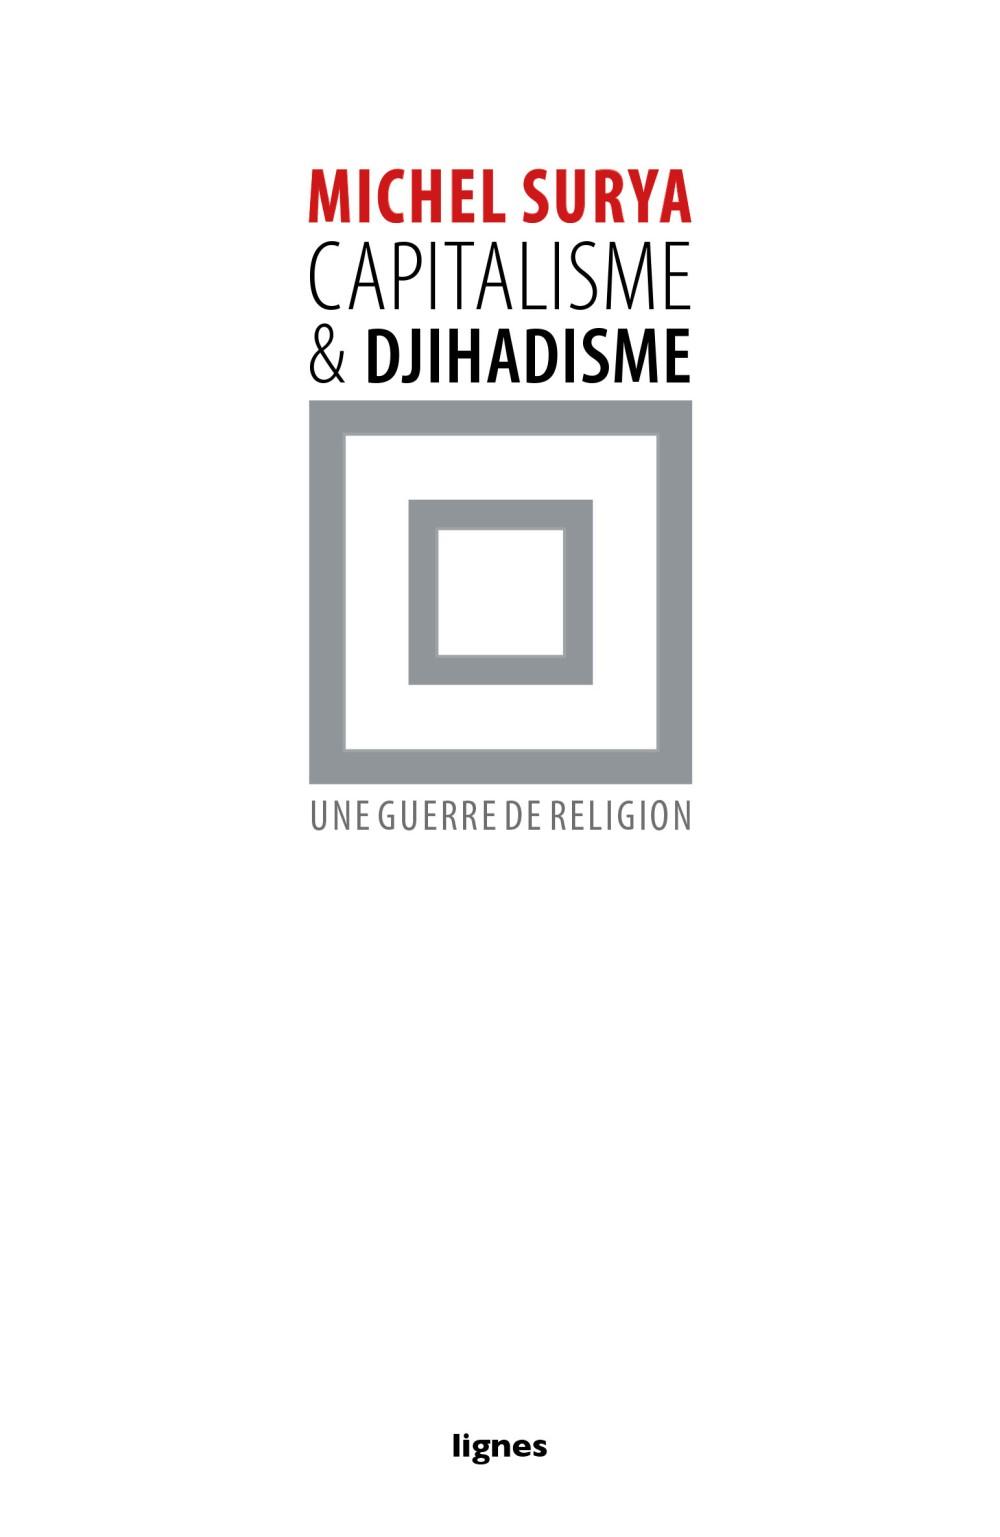 couv_surya_capitalisme_et_djihadisme_hd